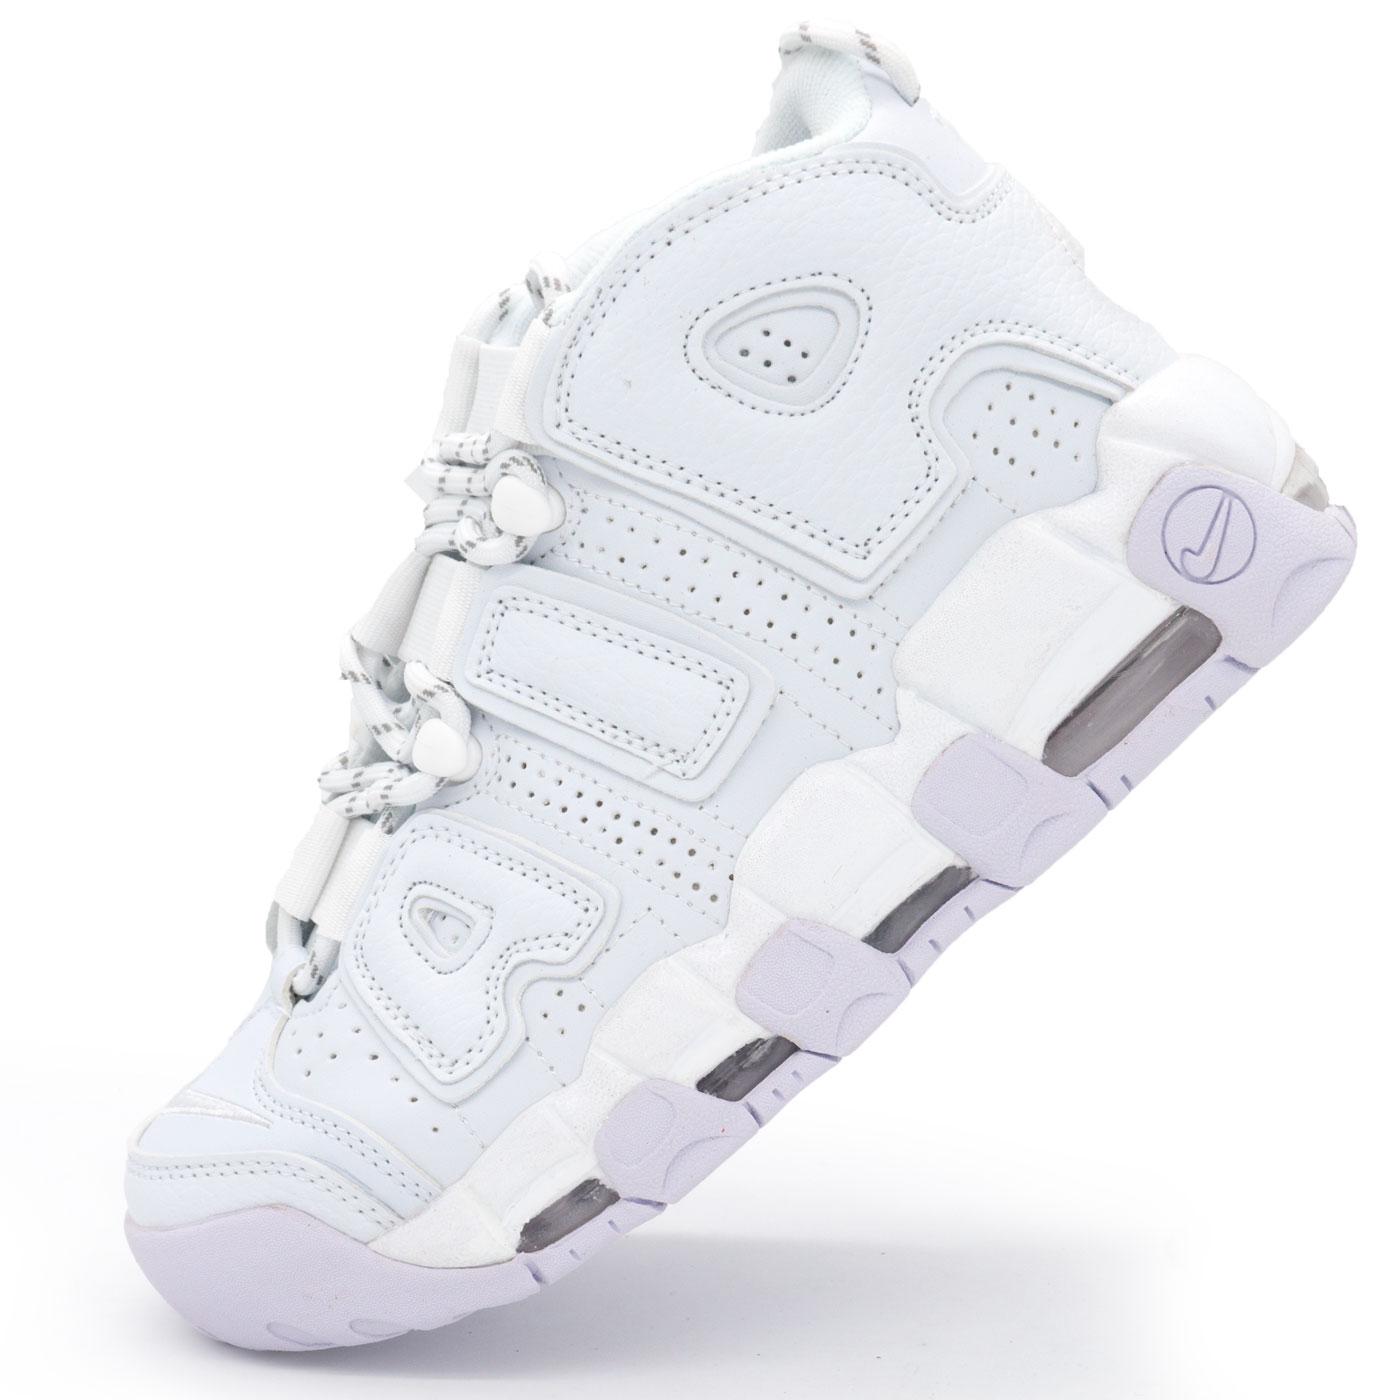 фото main Кроссовки Nike Air More Uptempo белые. Топ качество! main